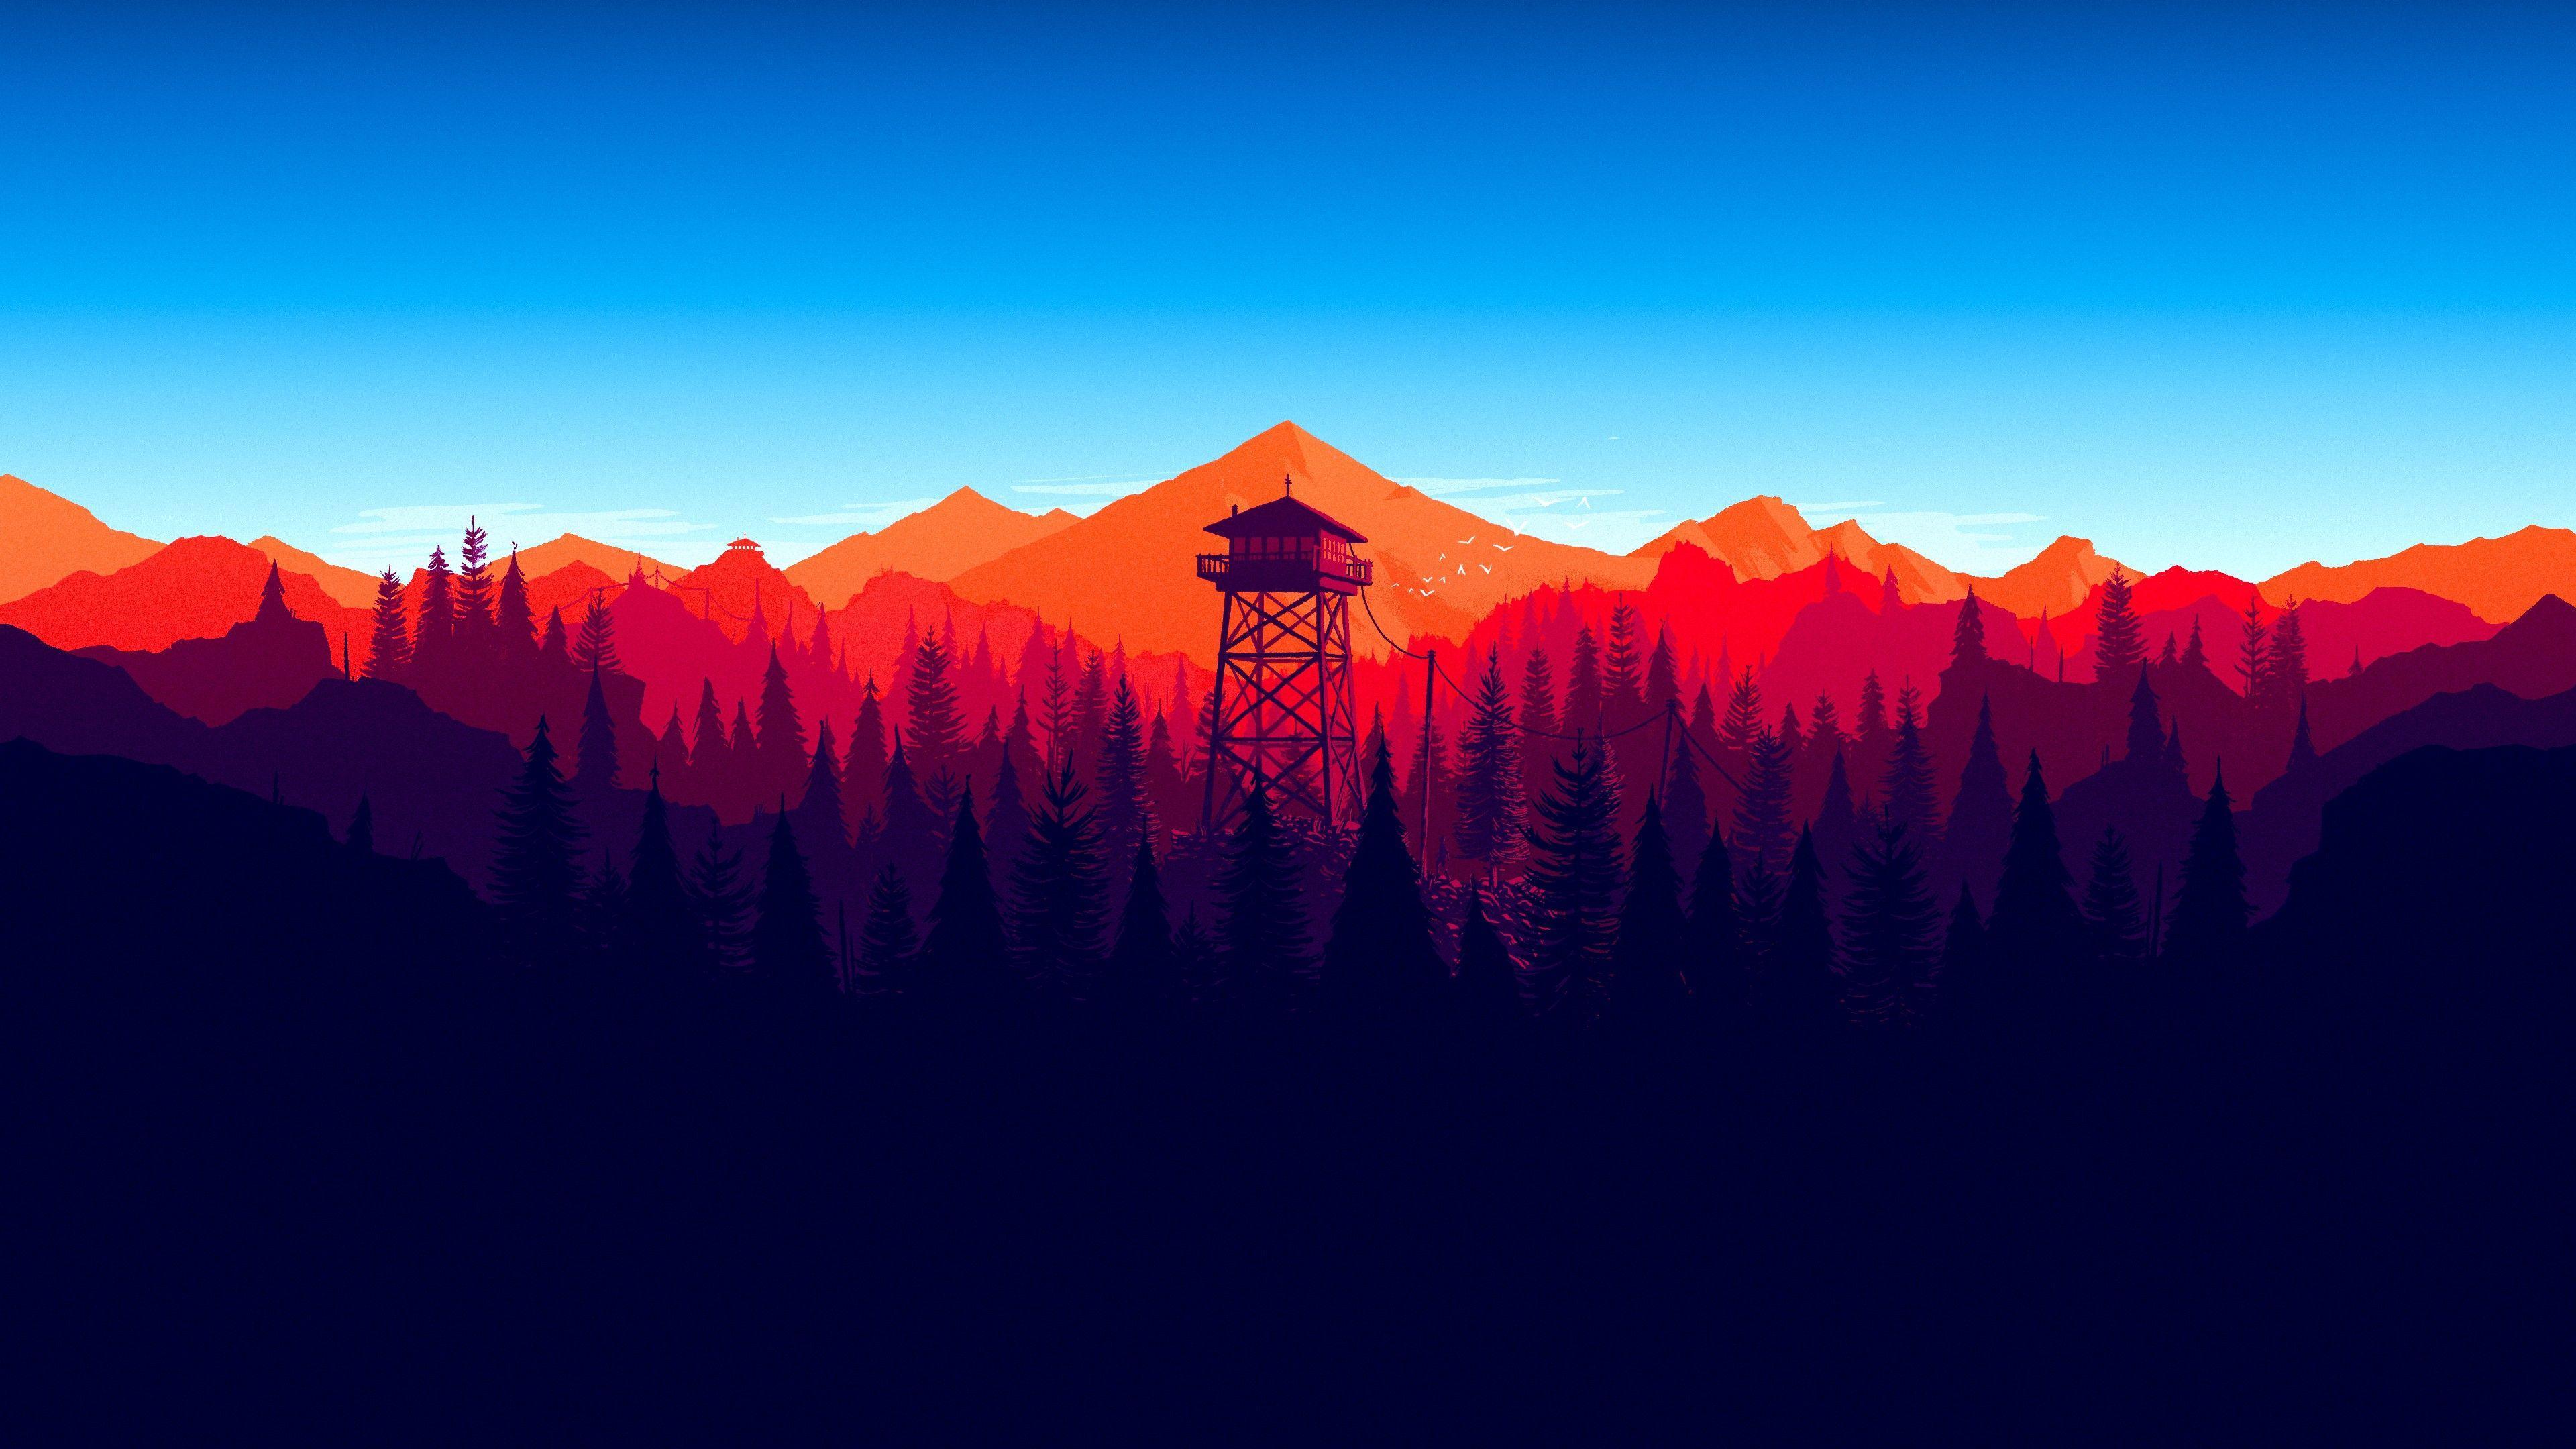 Computer 4k Wallpapers Top Free Computer 4k Backgrounds